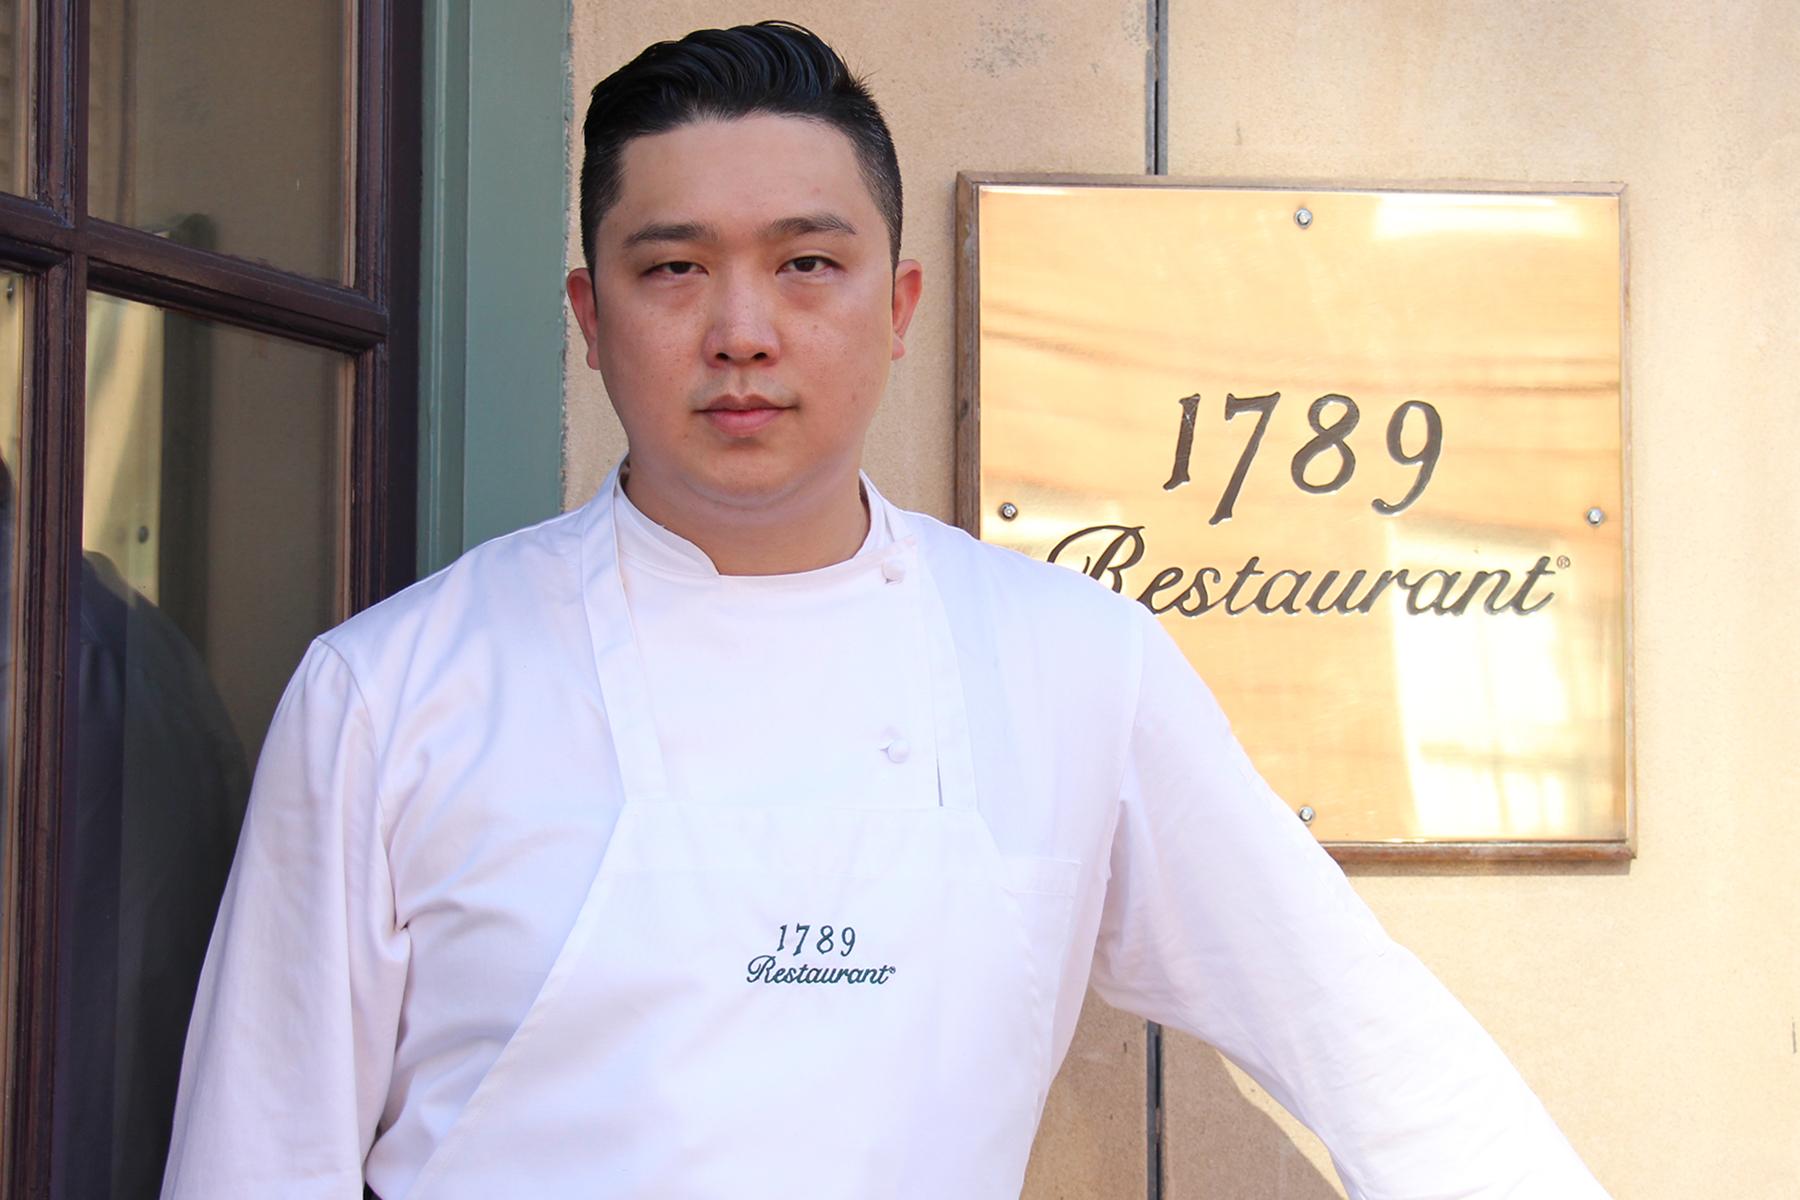 Samuel Kim is 1789 Restaurant's new executive chef. (Photo: 1789 Restaurant)